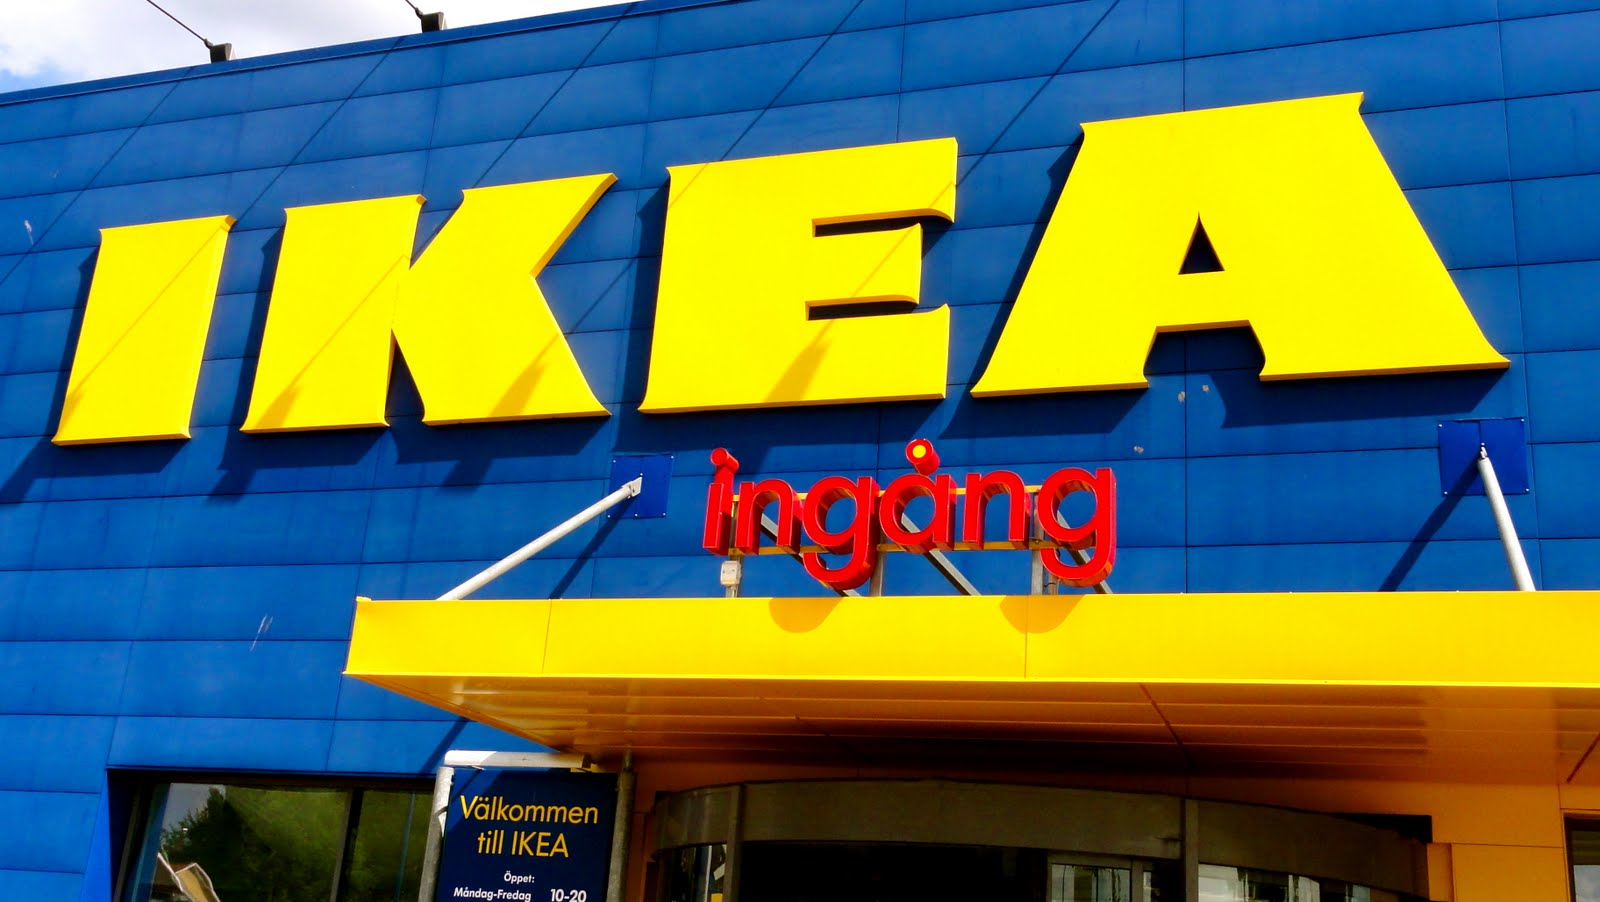 Experience et c tera ikea - Ikea cree sa chambre ...